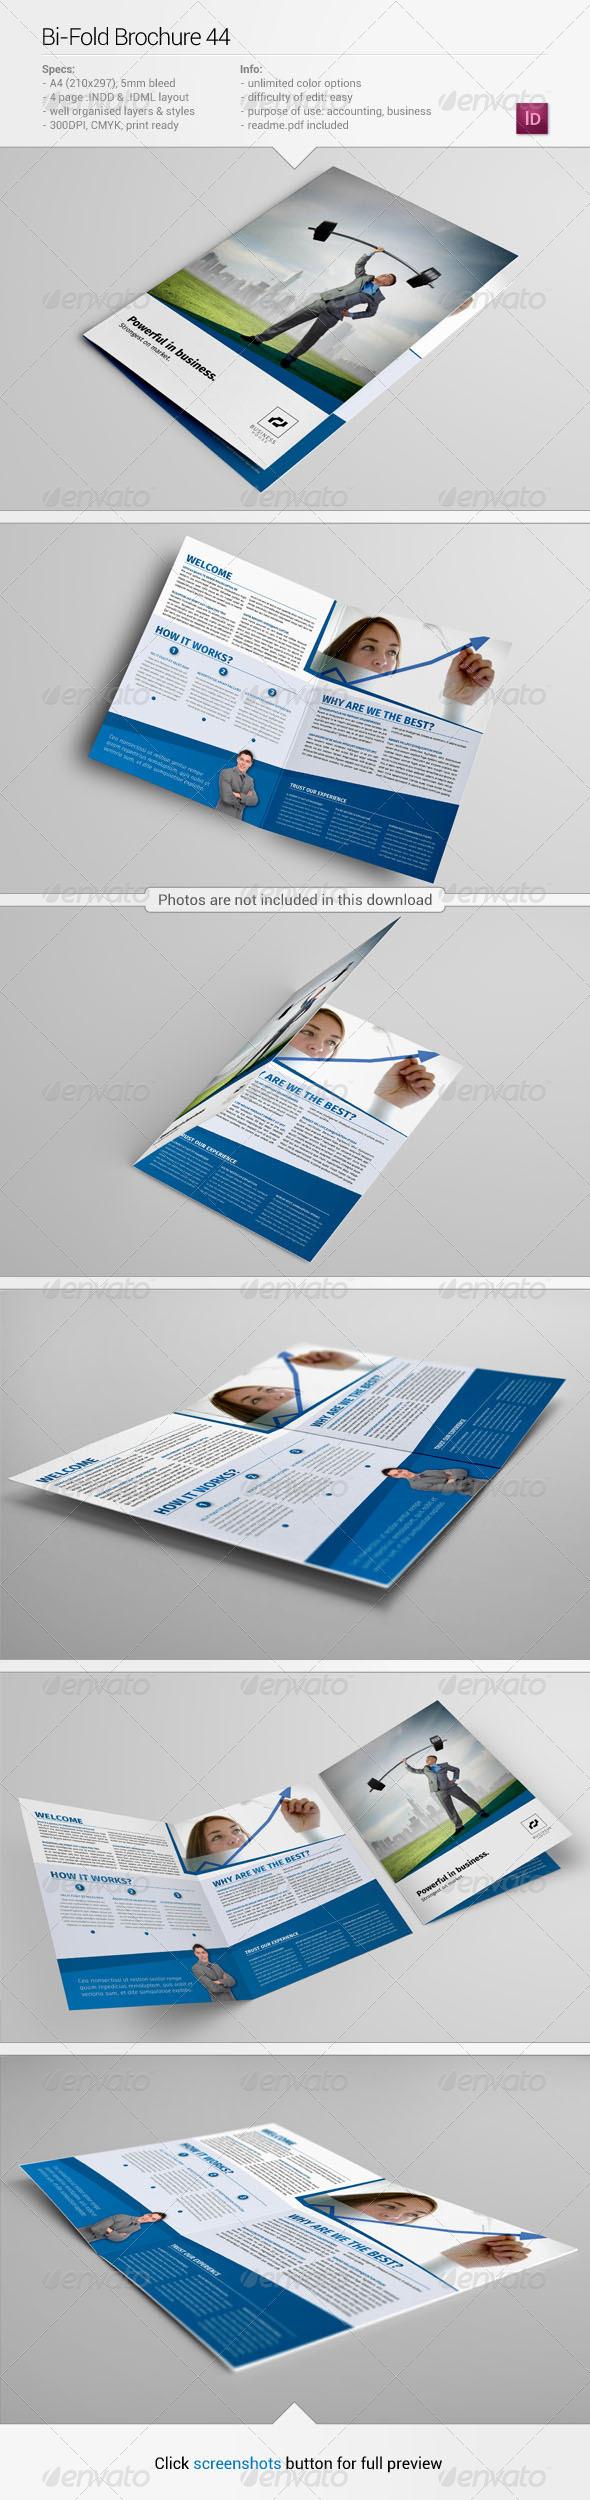 GraphicRiver Bi-Fold Brochure 44 6245228